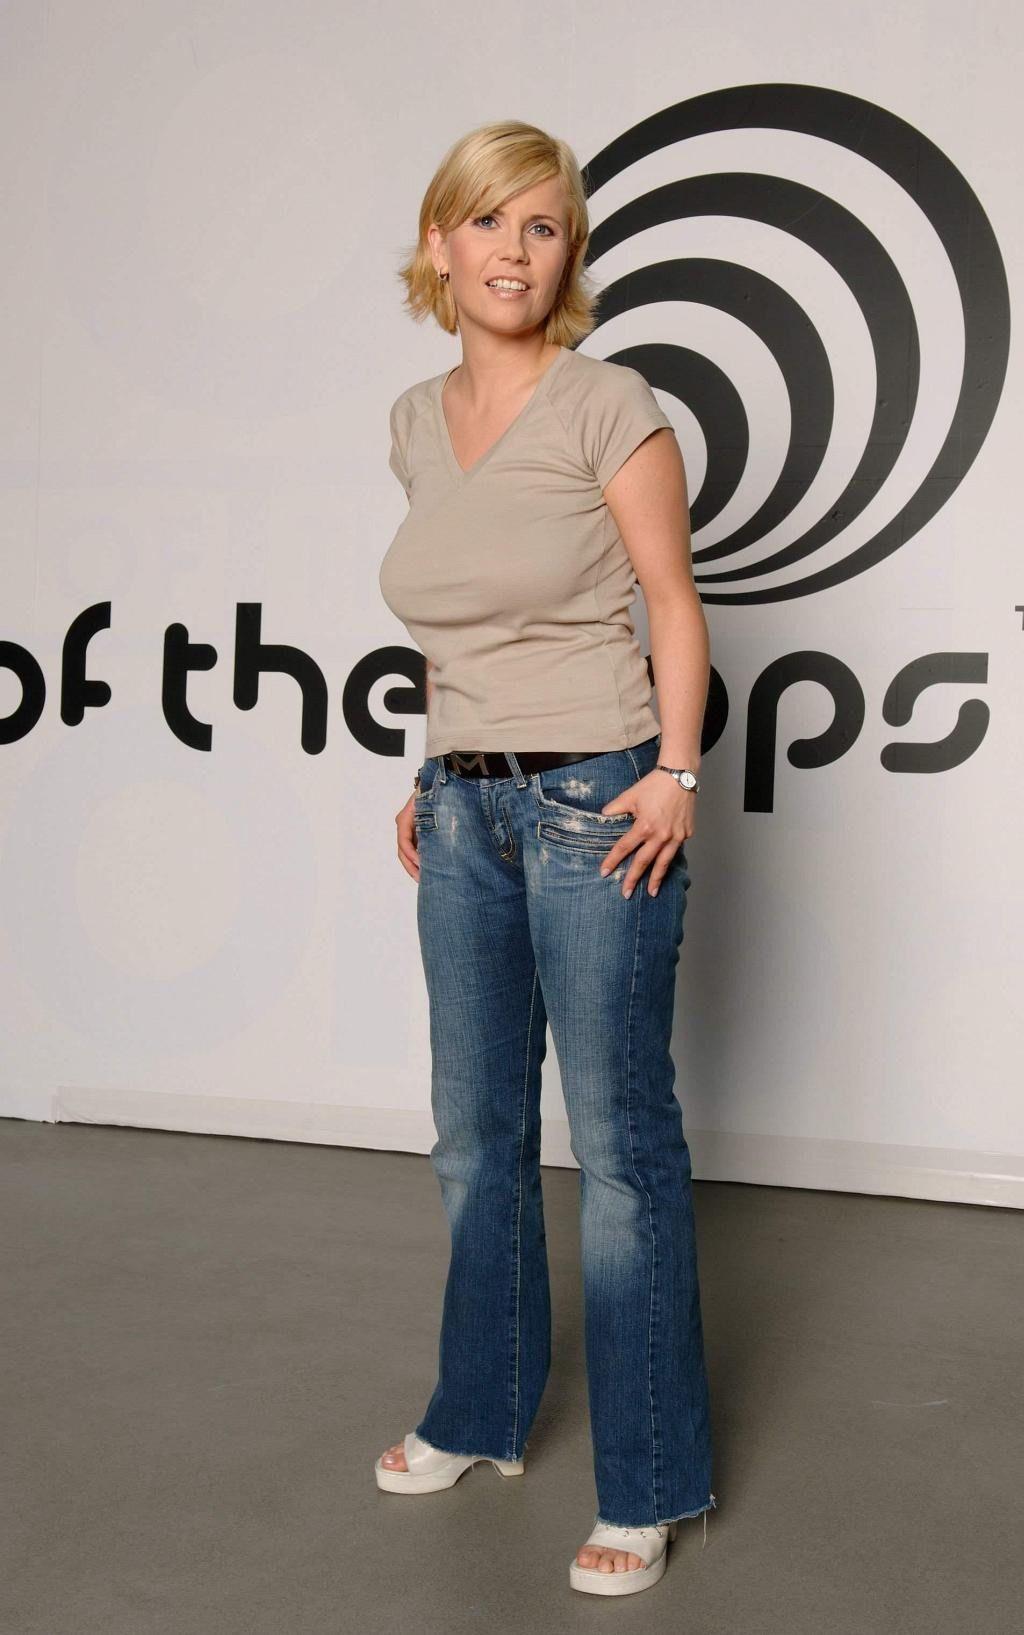 Michaela Schaffrath Hot